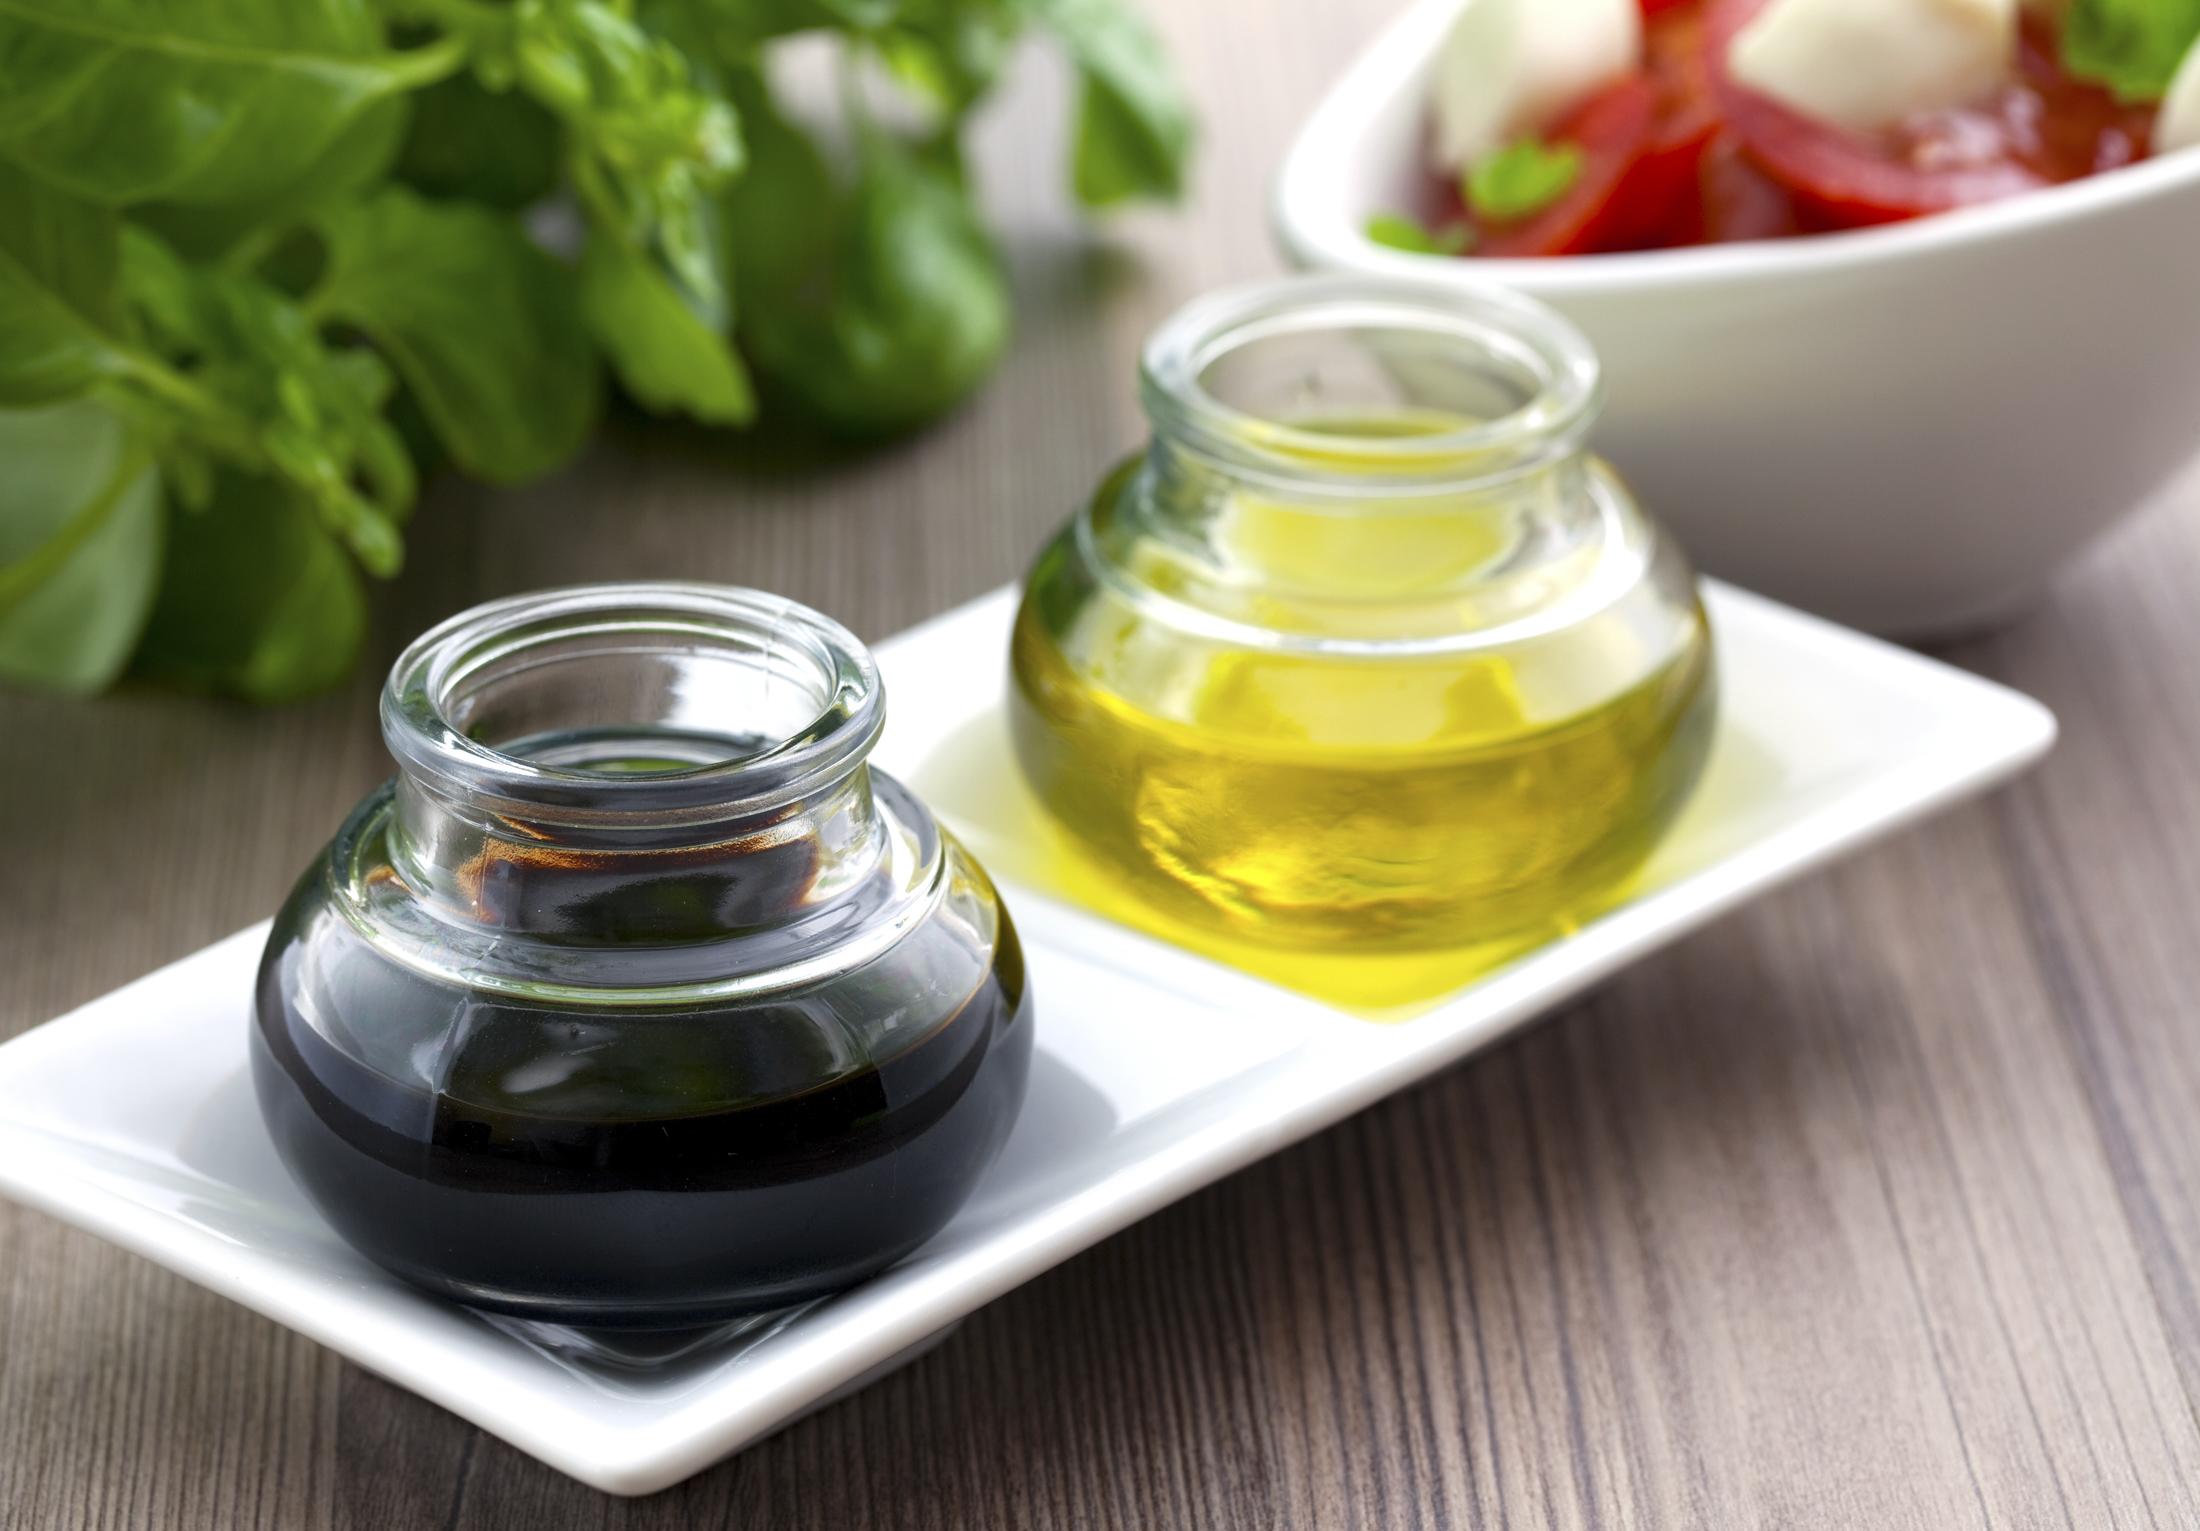 Balsamic vinegar and olive oil.